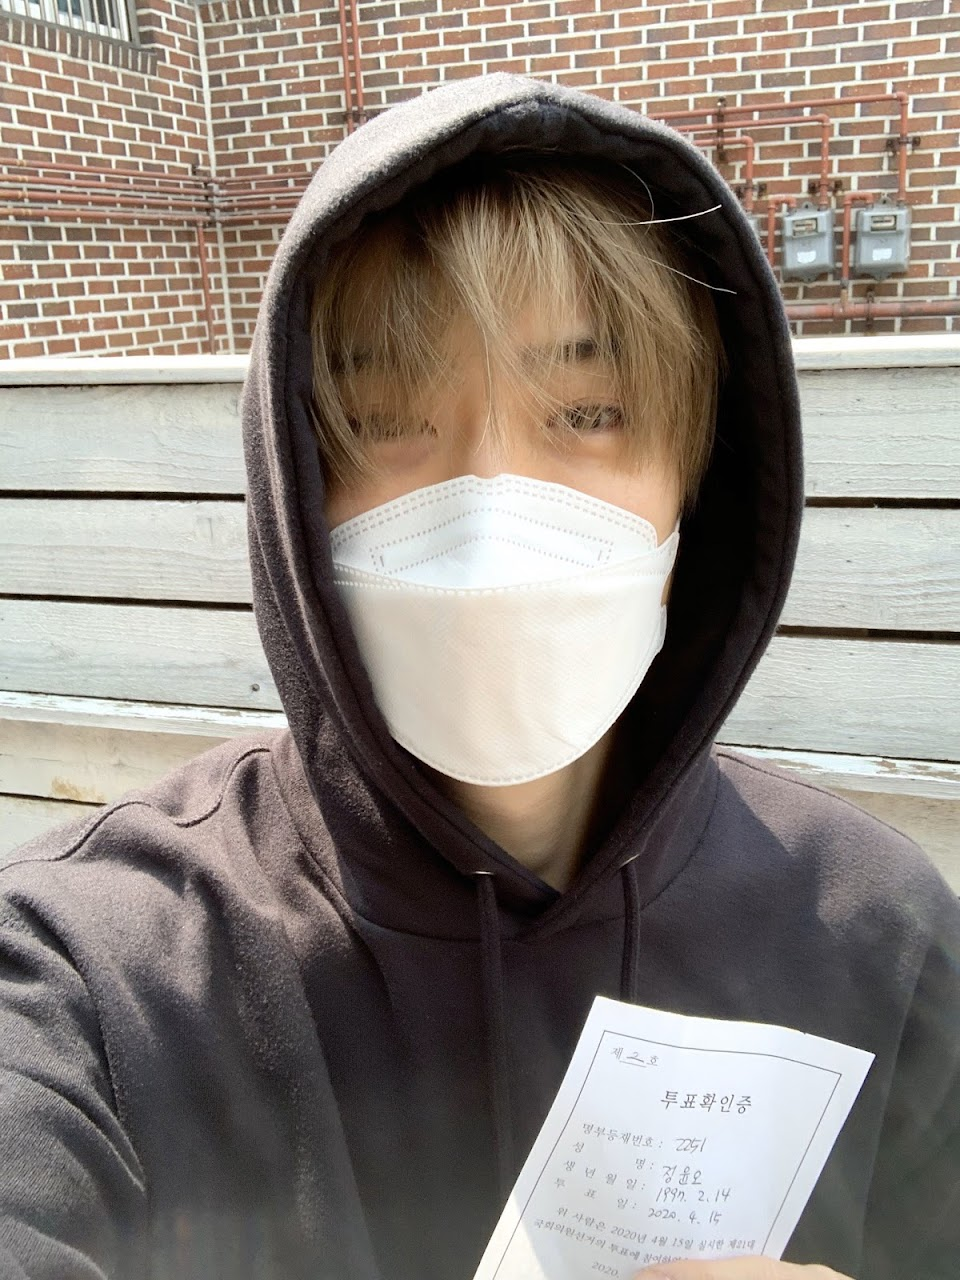 idolsvotingapril15_jaehyun